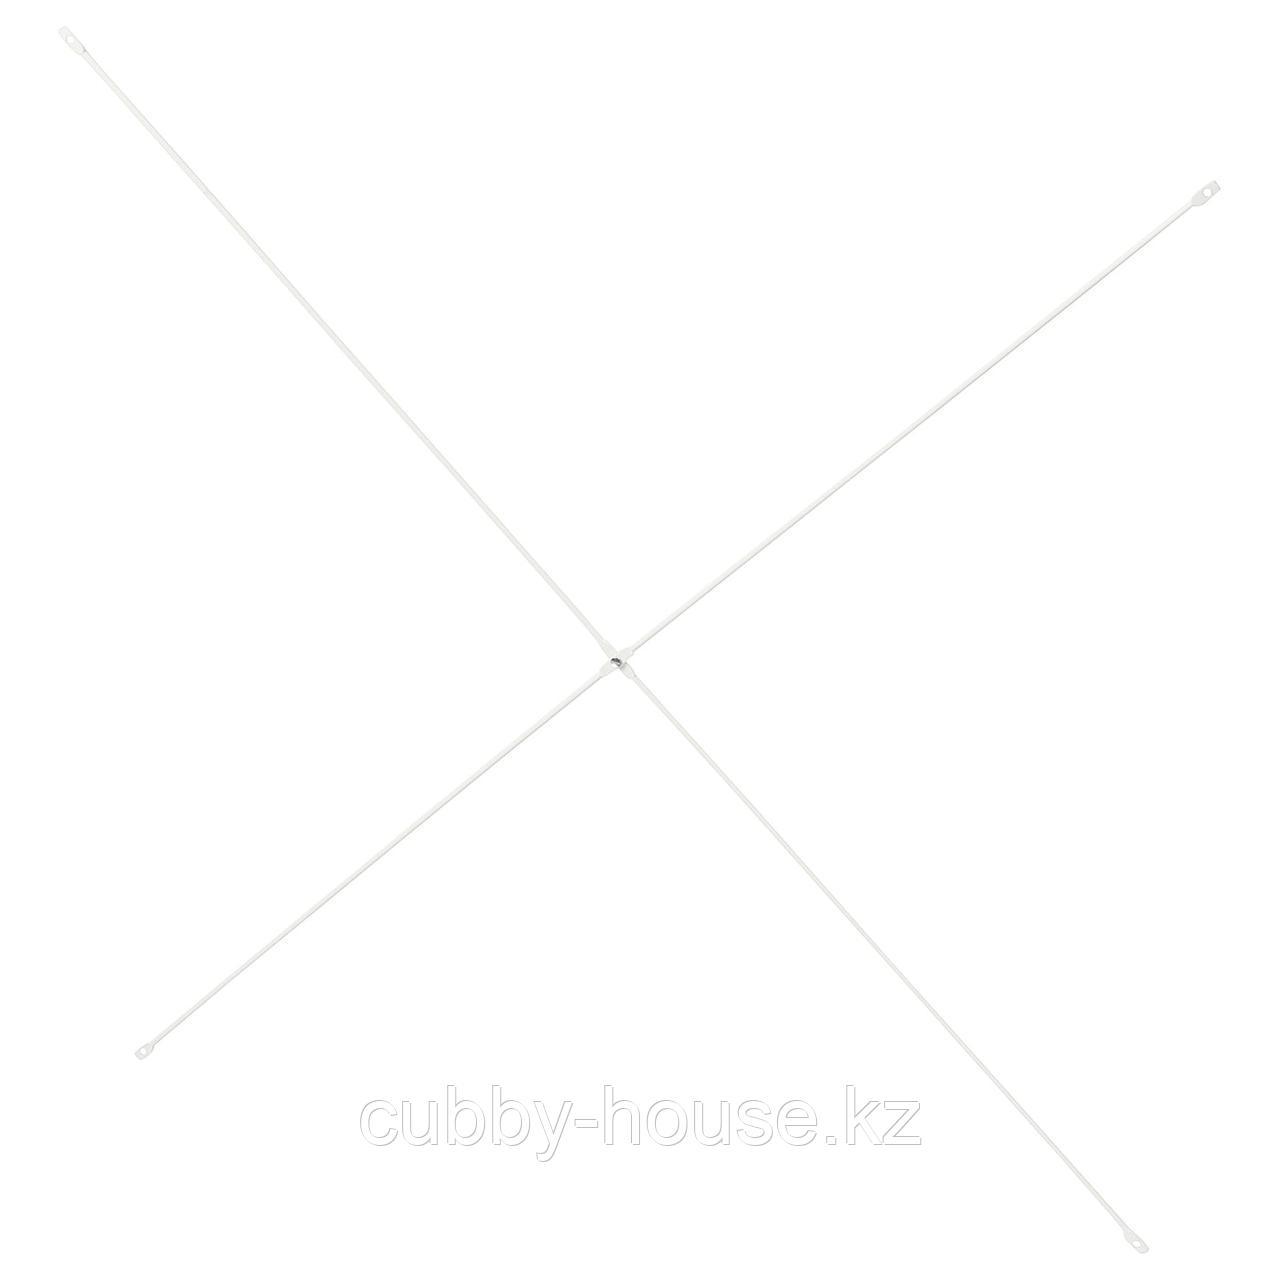 ЭЛВАРЛИ Крестовина, белый, 40 см